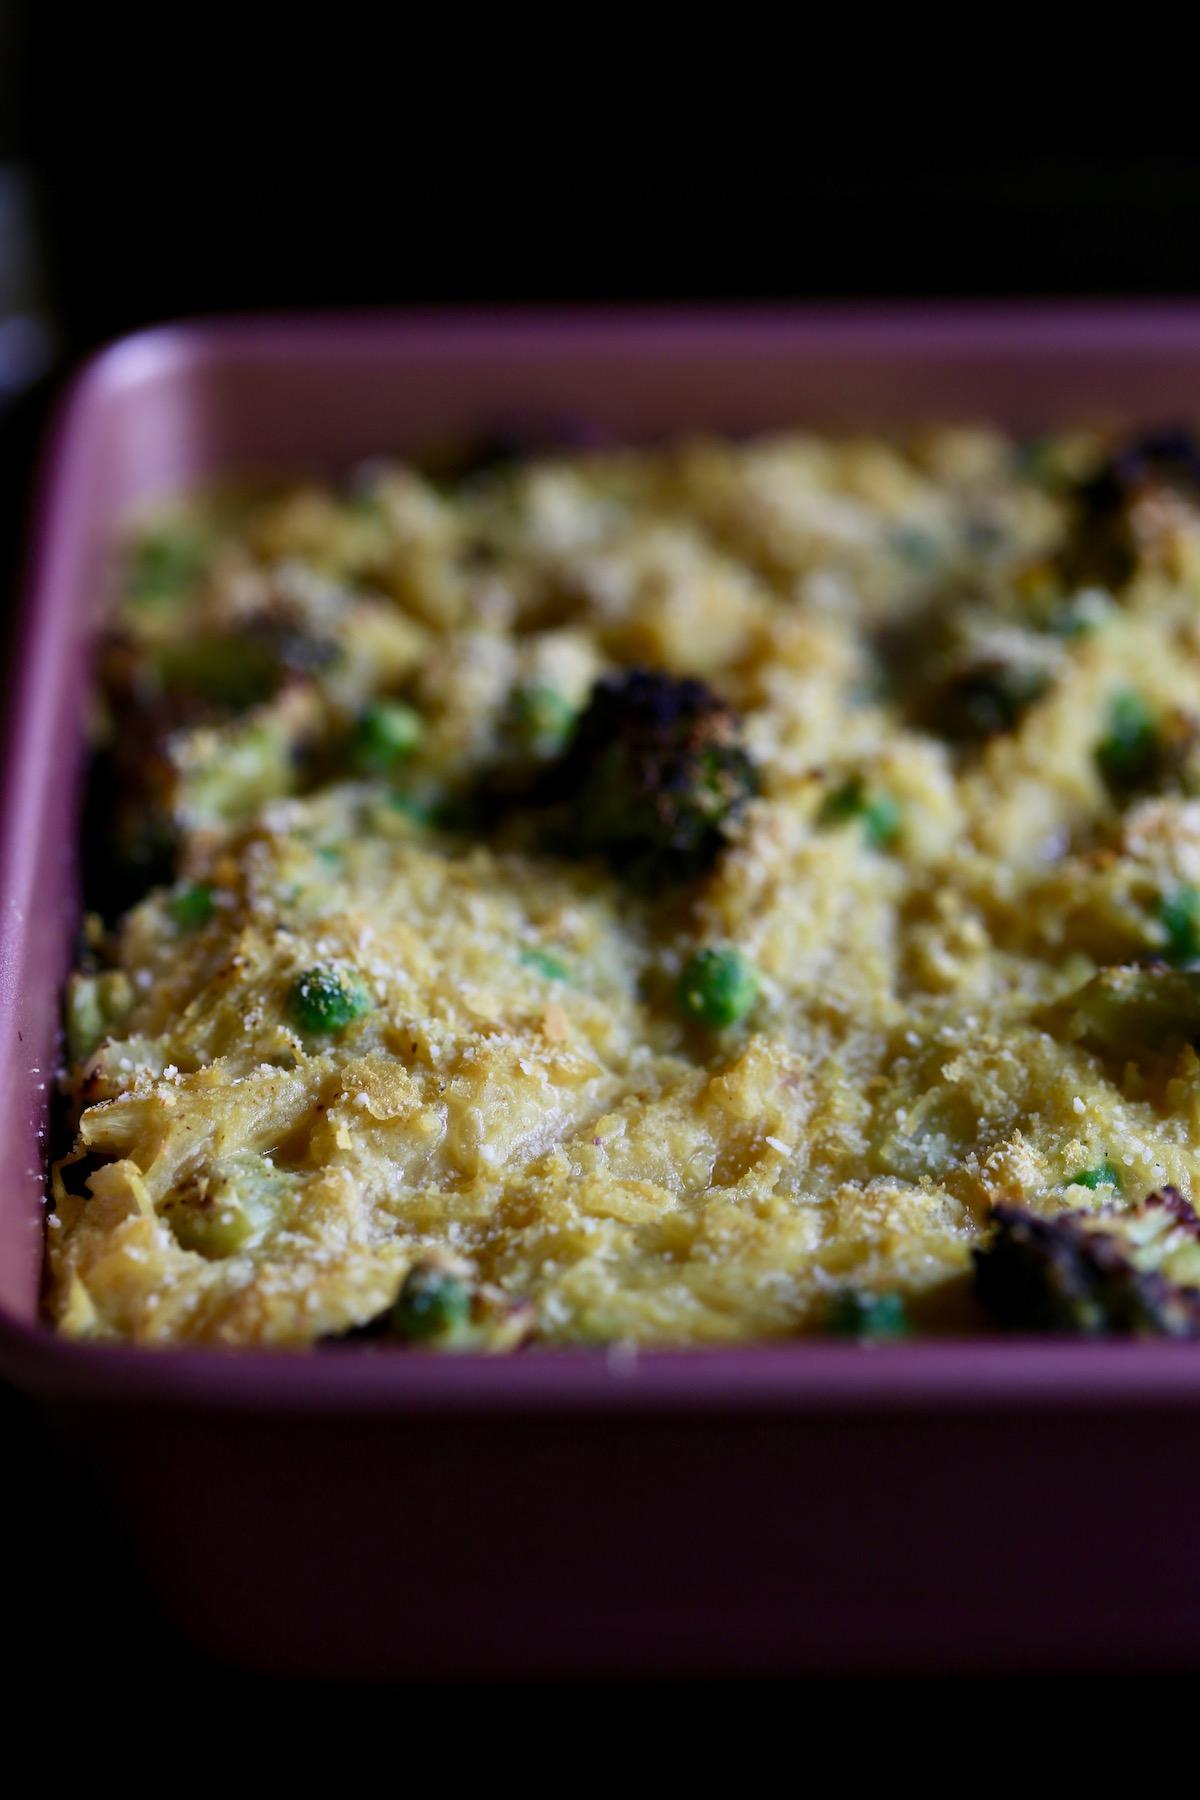 cheesy vegan spaghetti squash casserole hot out of the oven